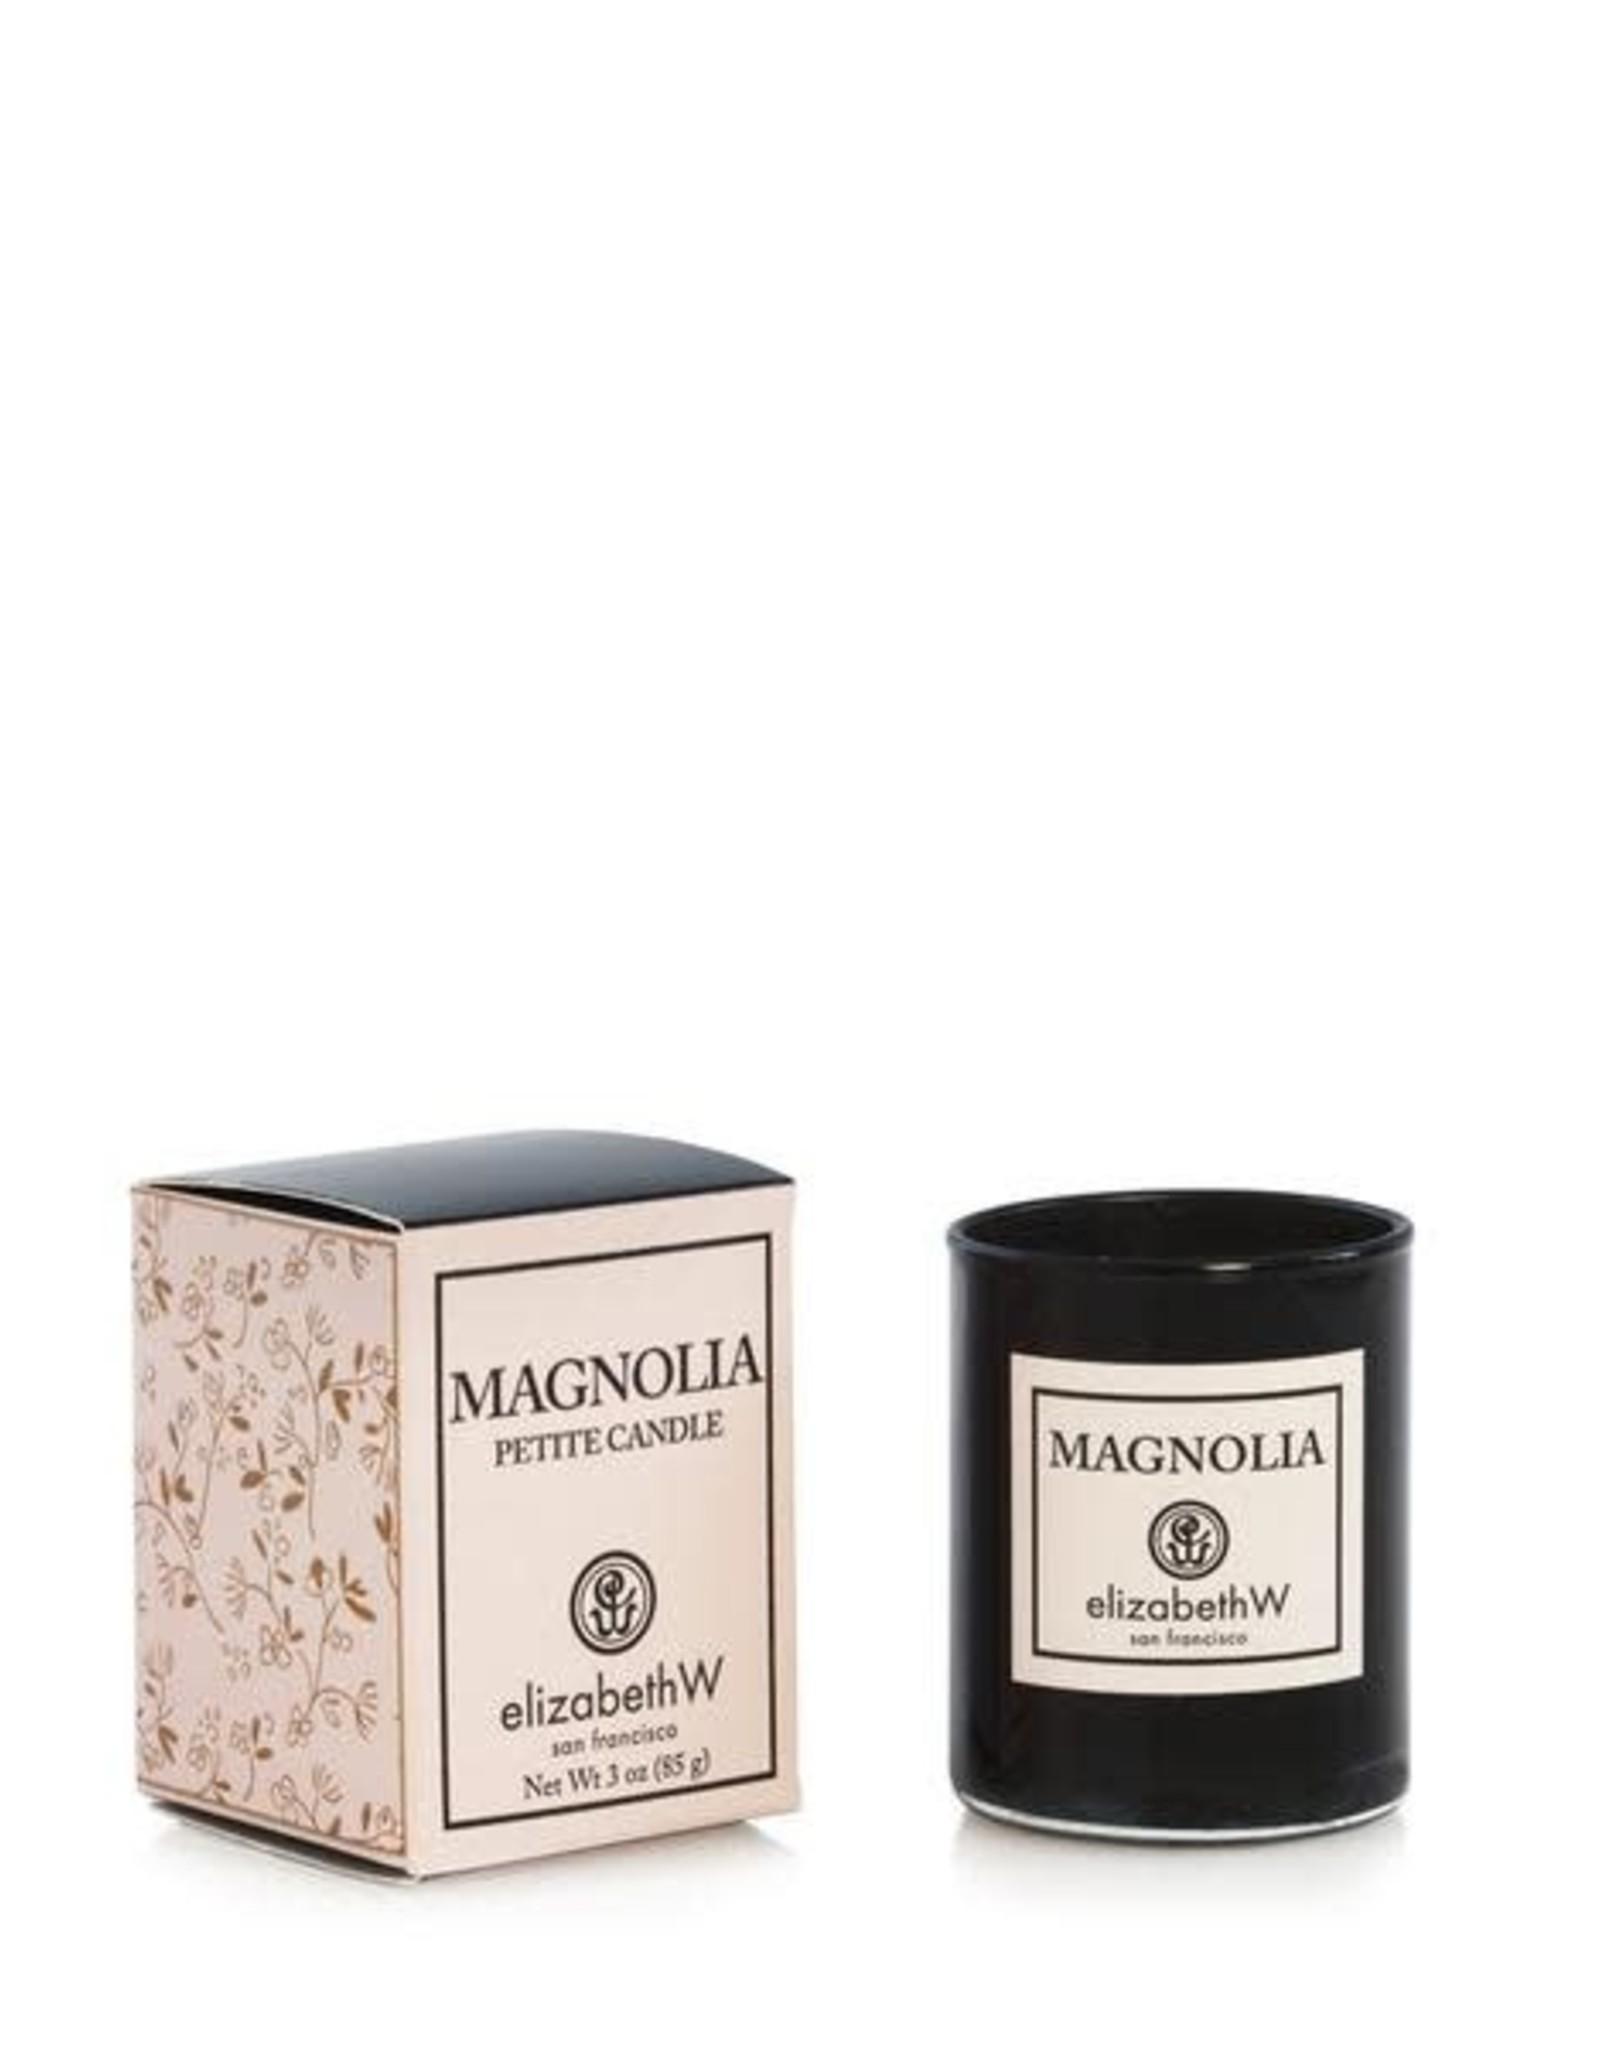 Elizabeth W. Magnolia Petite Candle 3 oz